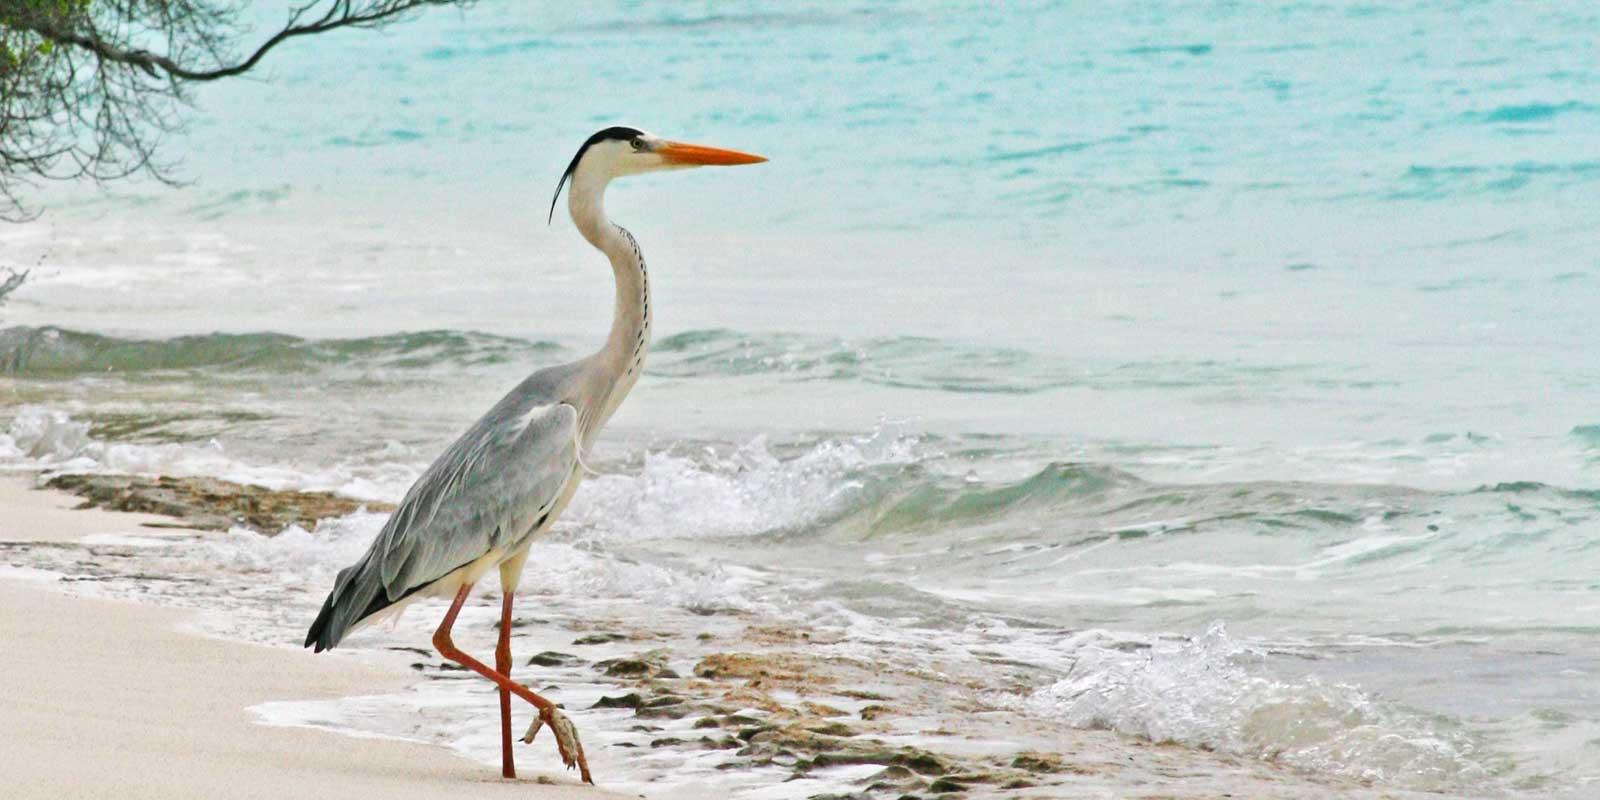 OCOA_SONEVA_FUSHI_RESORT_MALDIVES_10